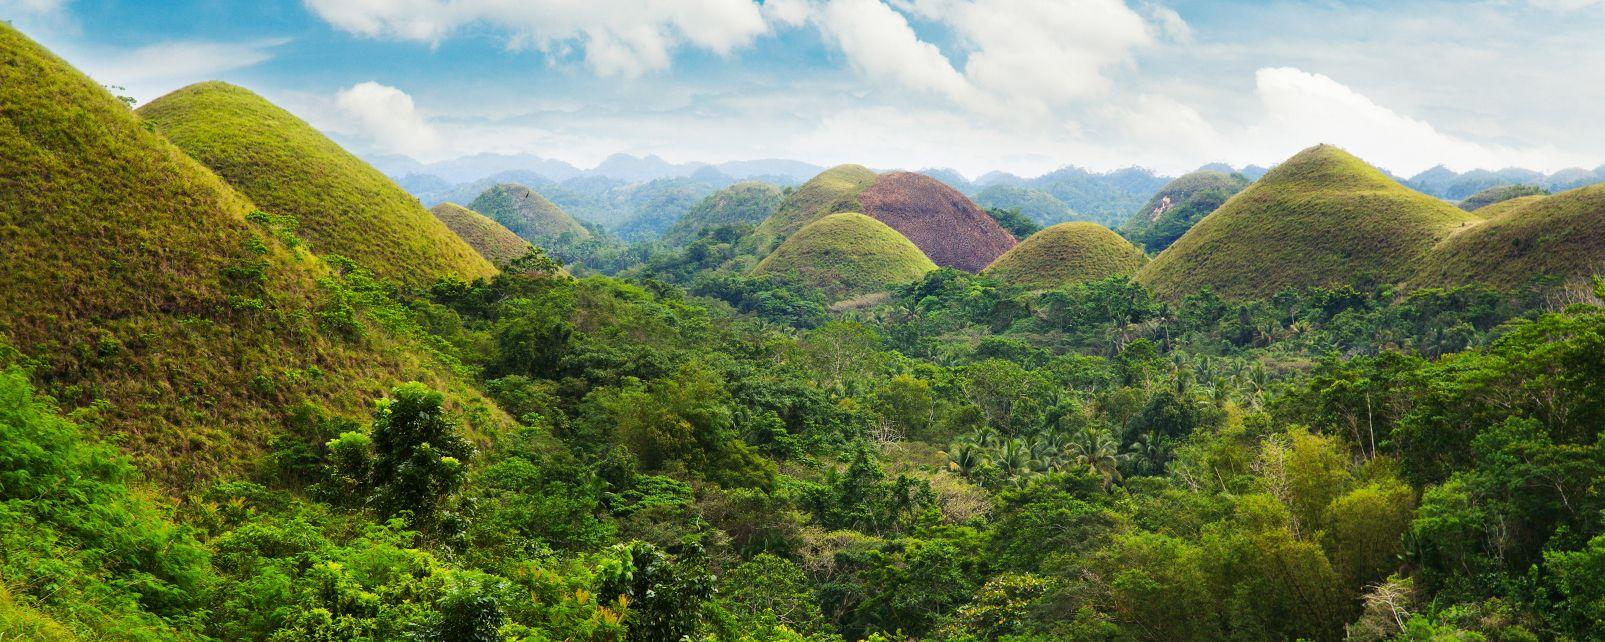 The Chocolate Hills Philippines